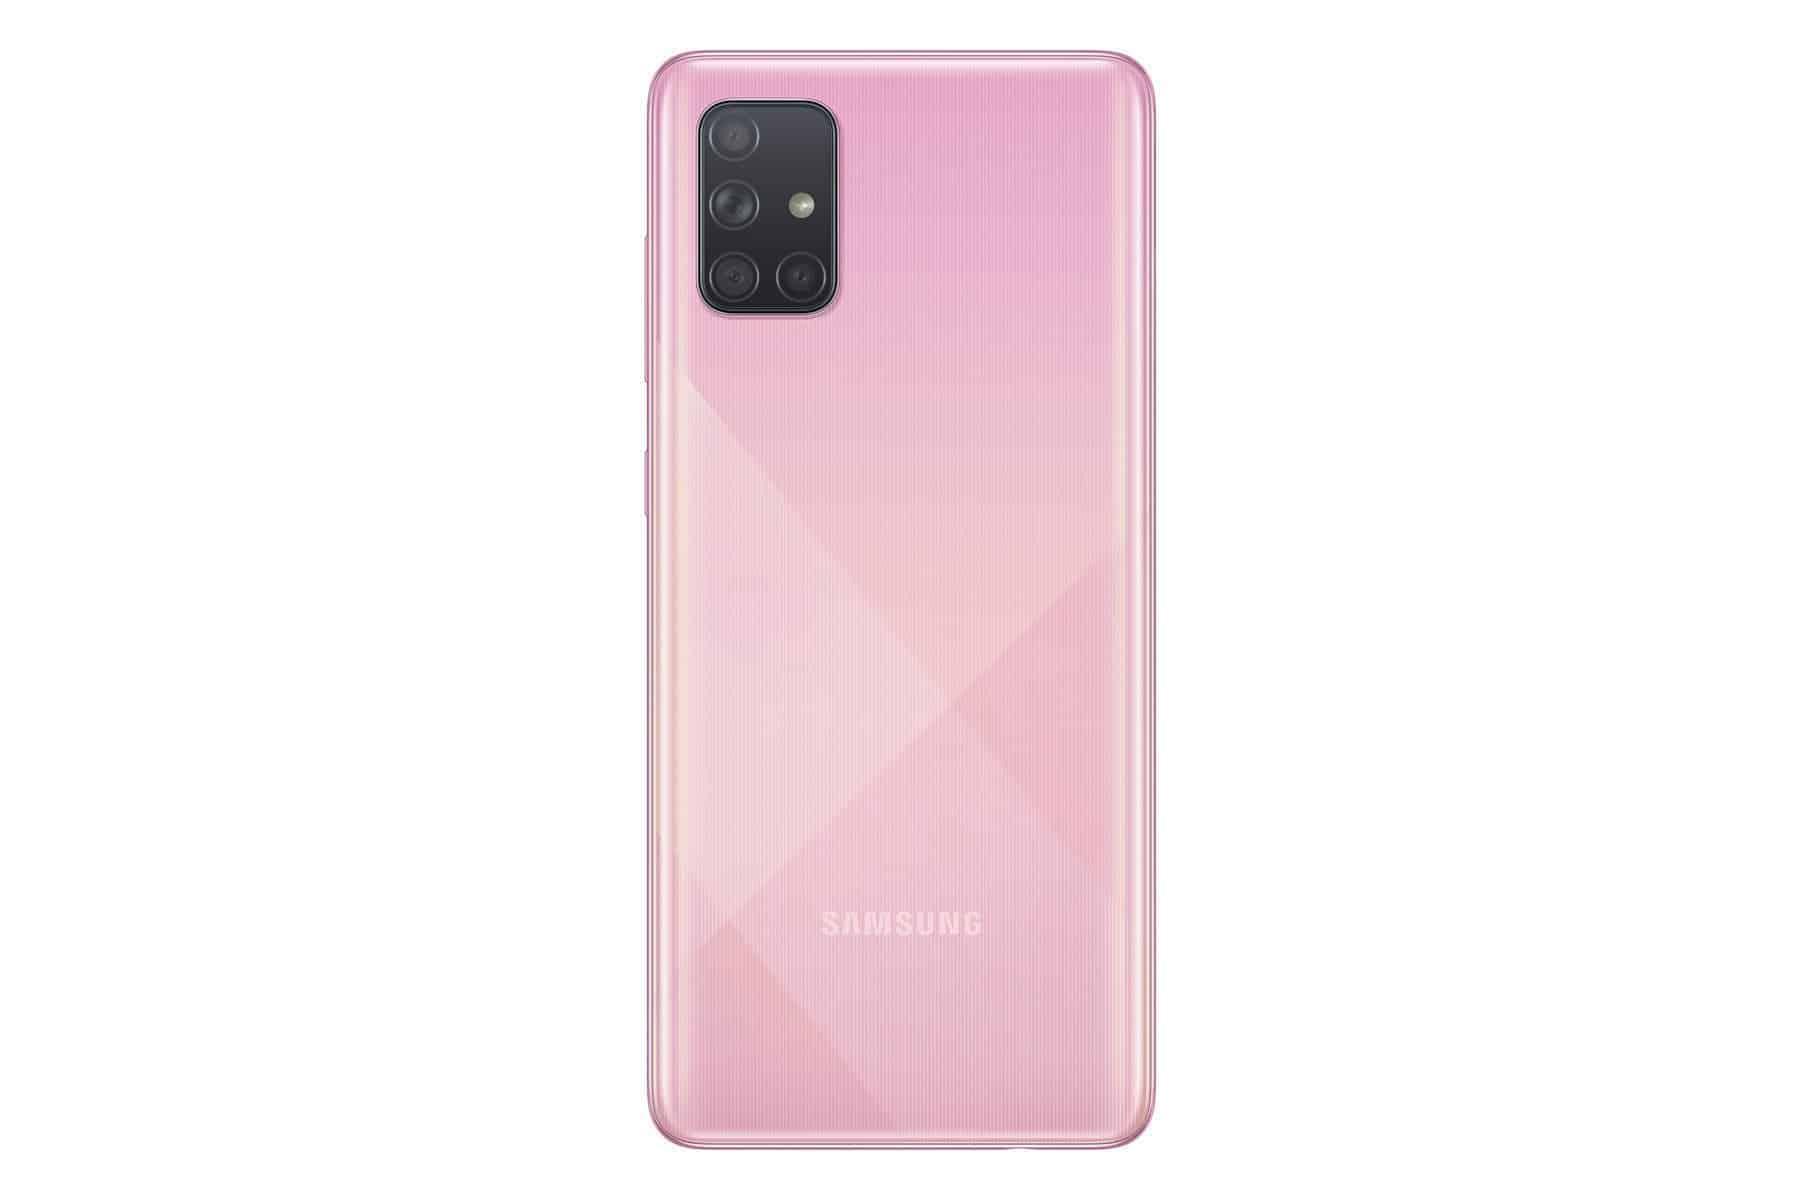 Galaxy A71 image 4